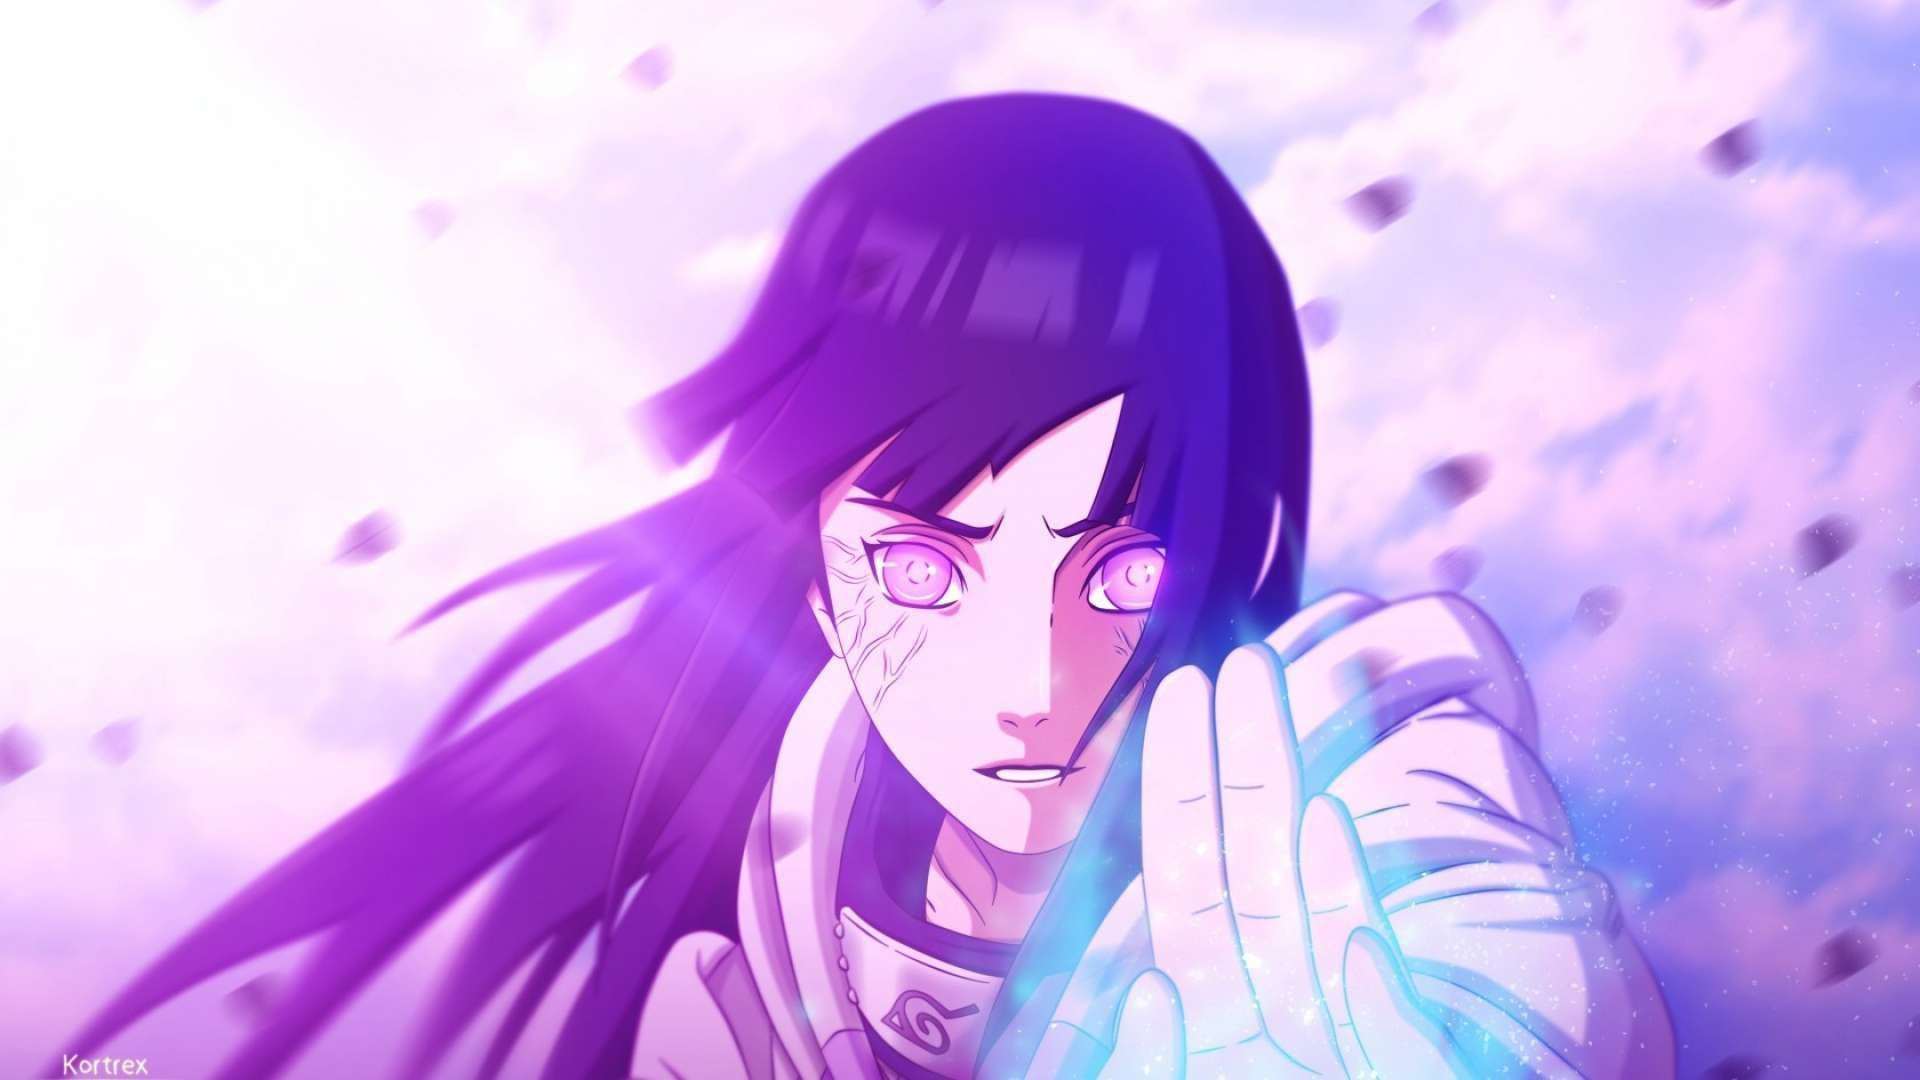 Mark Hd Naruto Shippuden Anime Naruto Wallpaper Anime